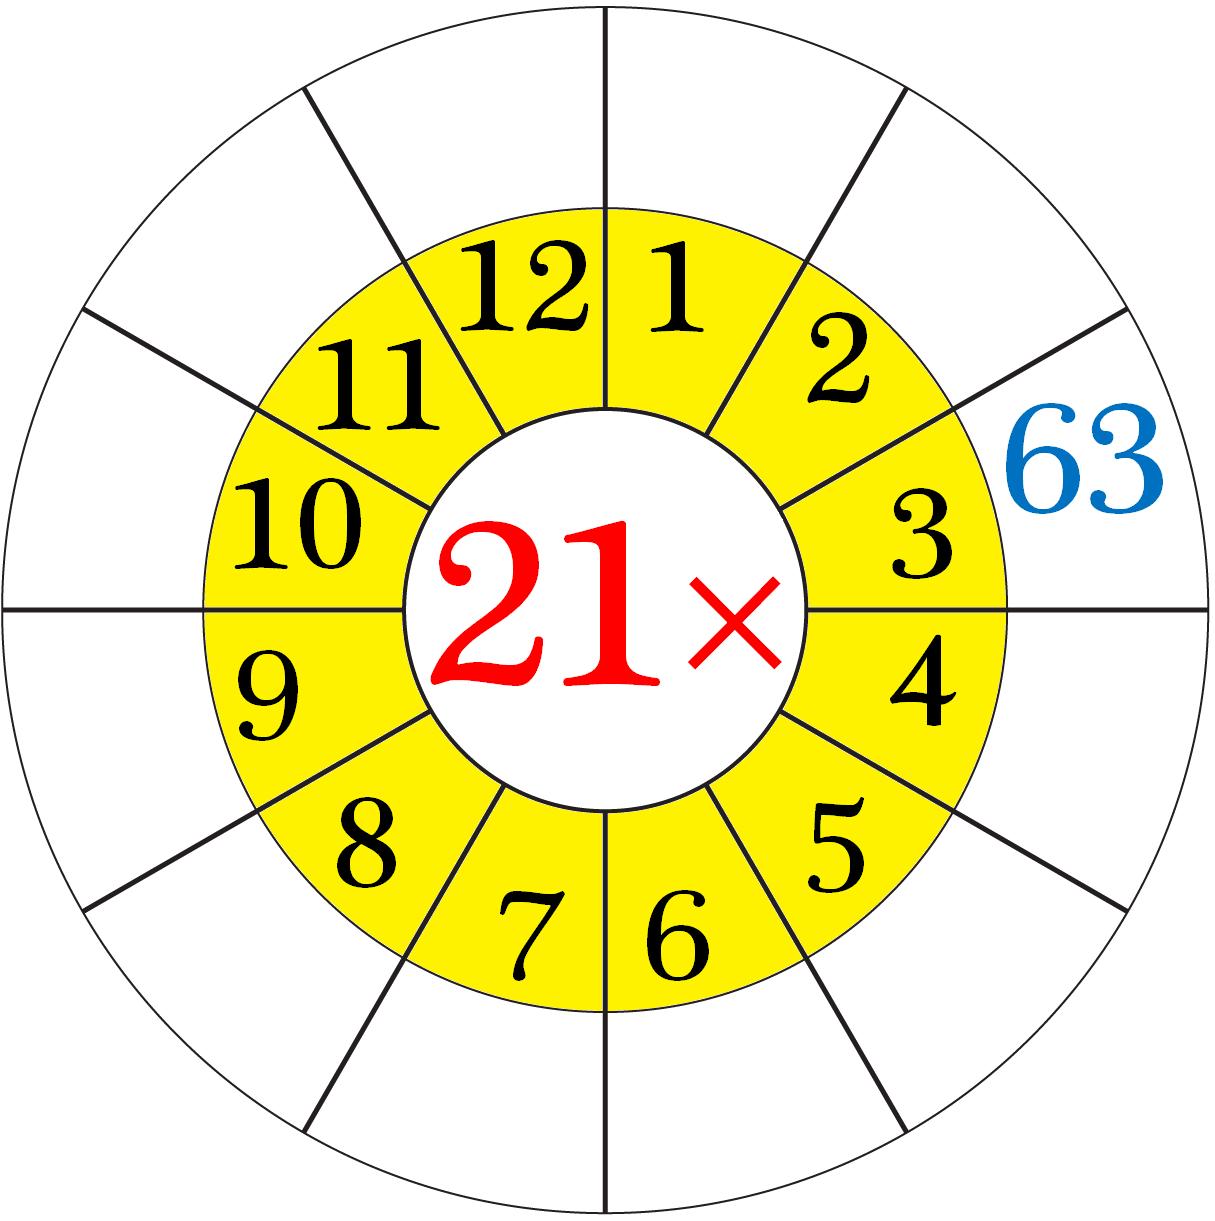 Worksheet On Multiplication Table Of 21